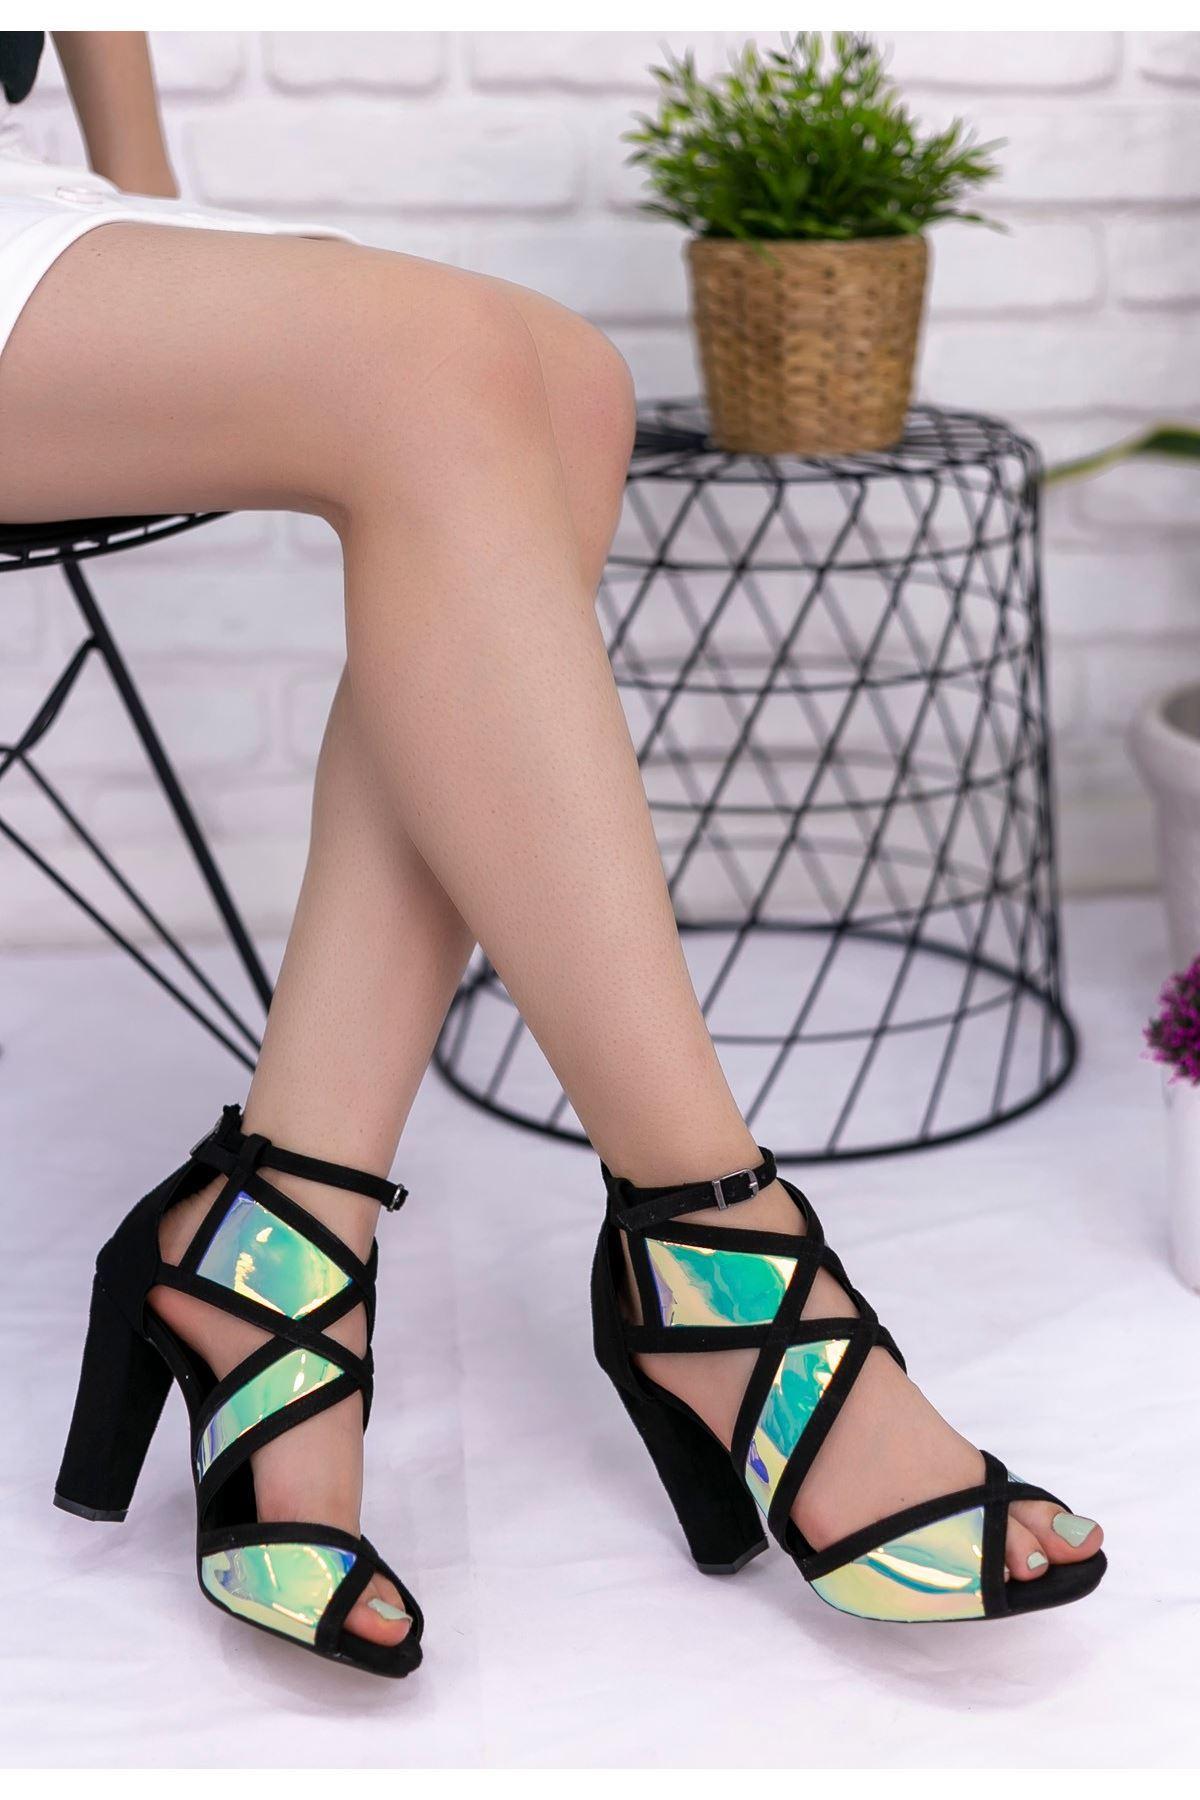 Mauri Siyah Süet Aynalı Topuklu Ayakkabı